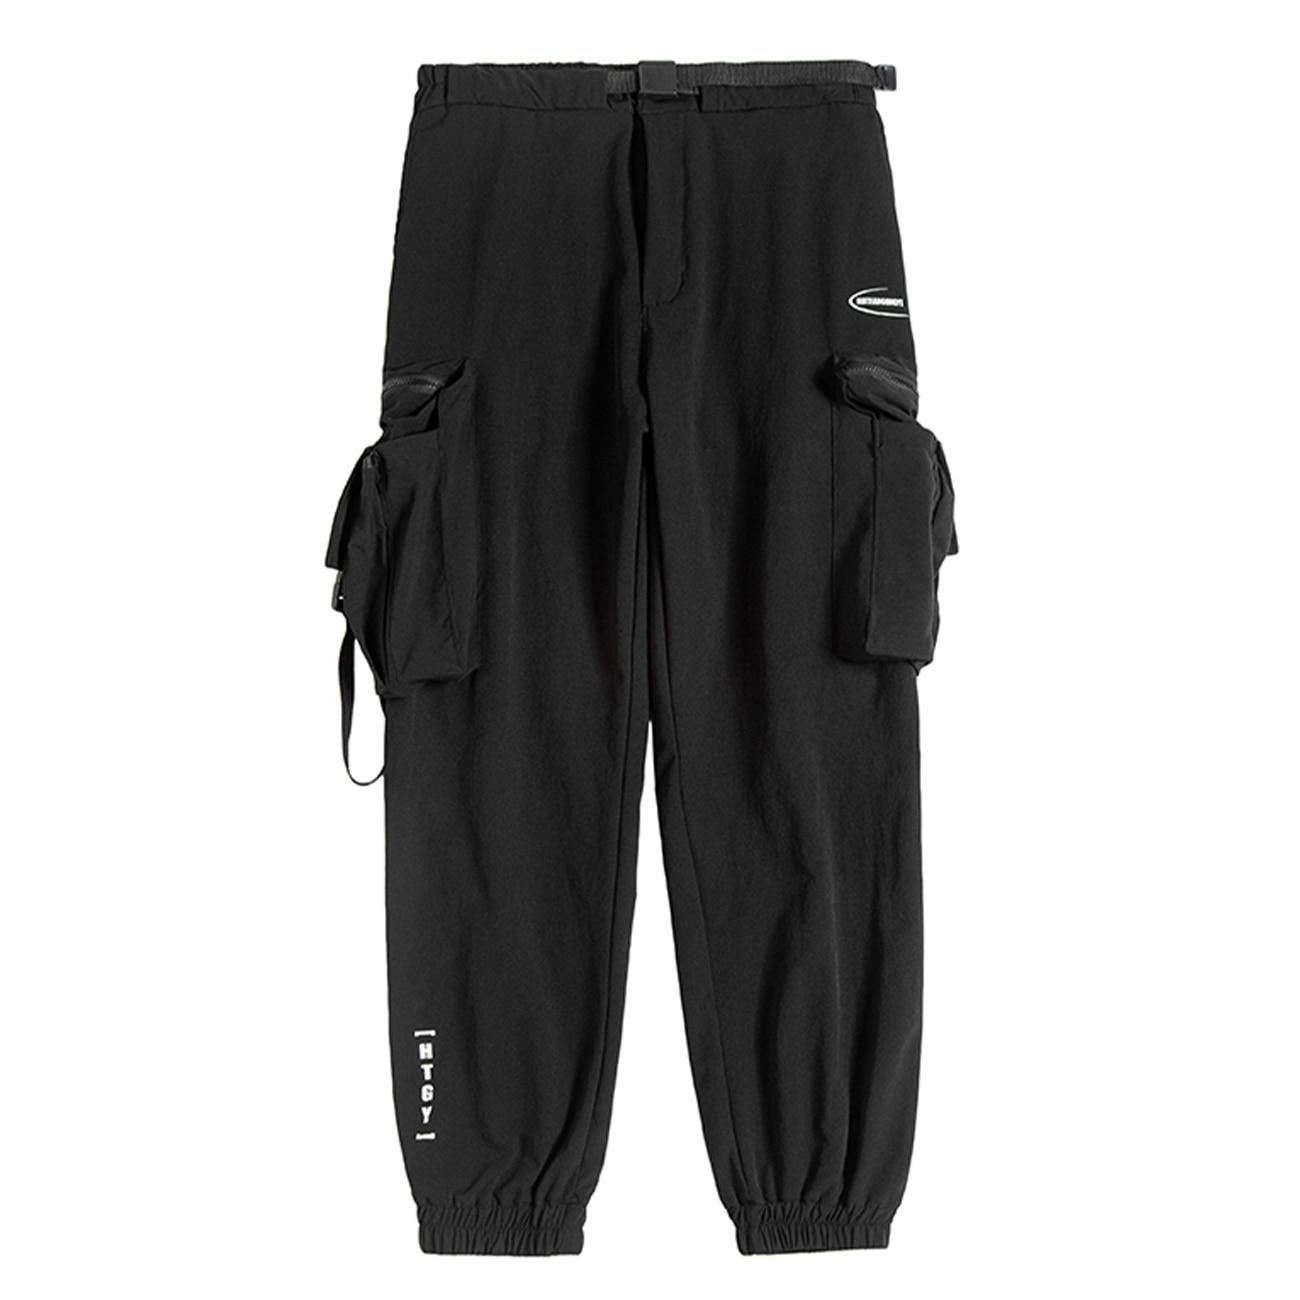 11 Bybb's Dark Letterprint Ribbons Cargo Pants Man Tactical Function Pants Streetwear Harajuku Joggers Men Trousers PocketBlack